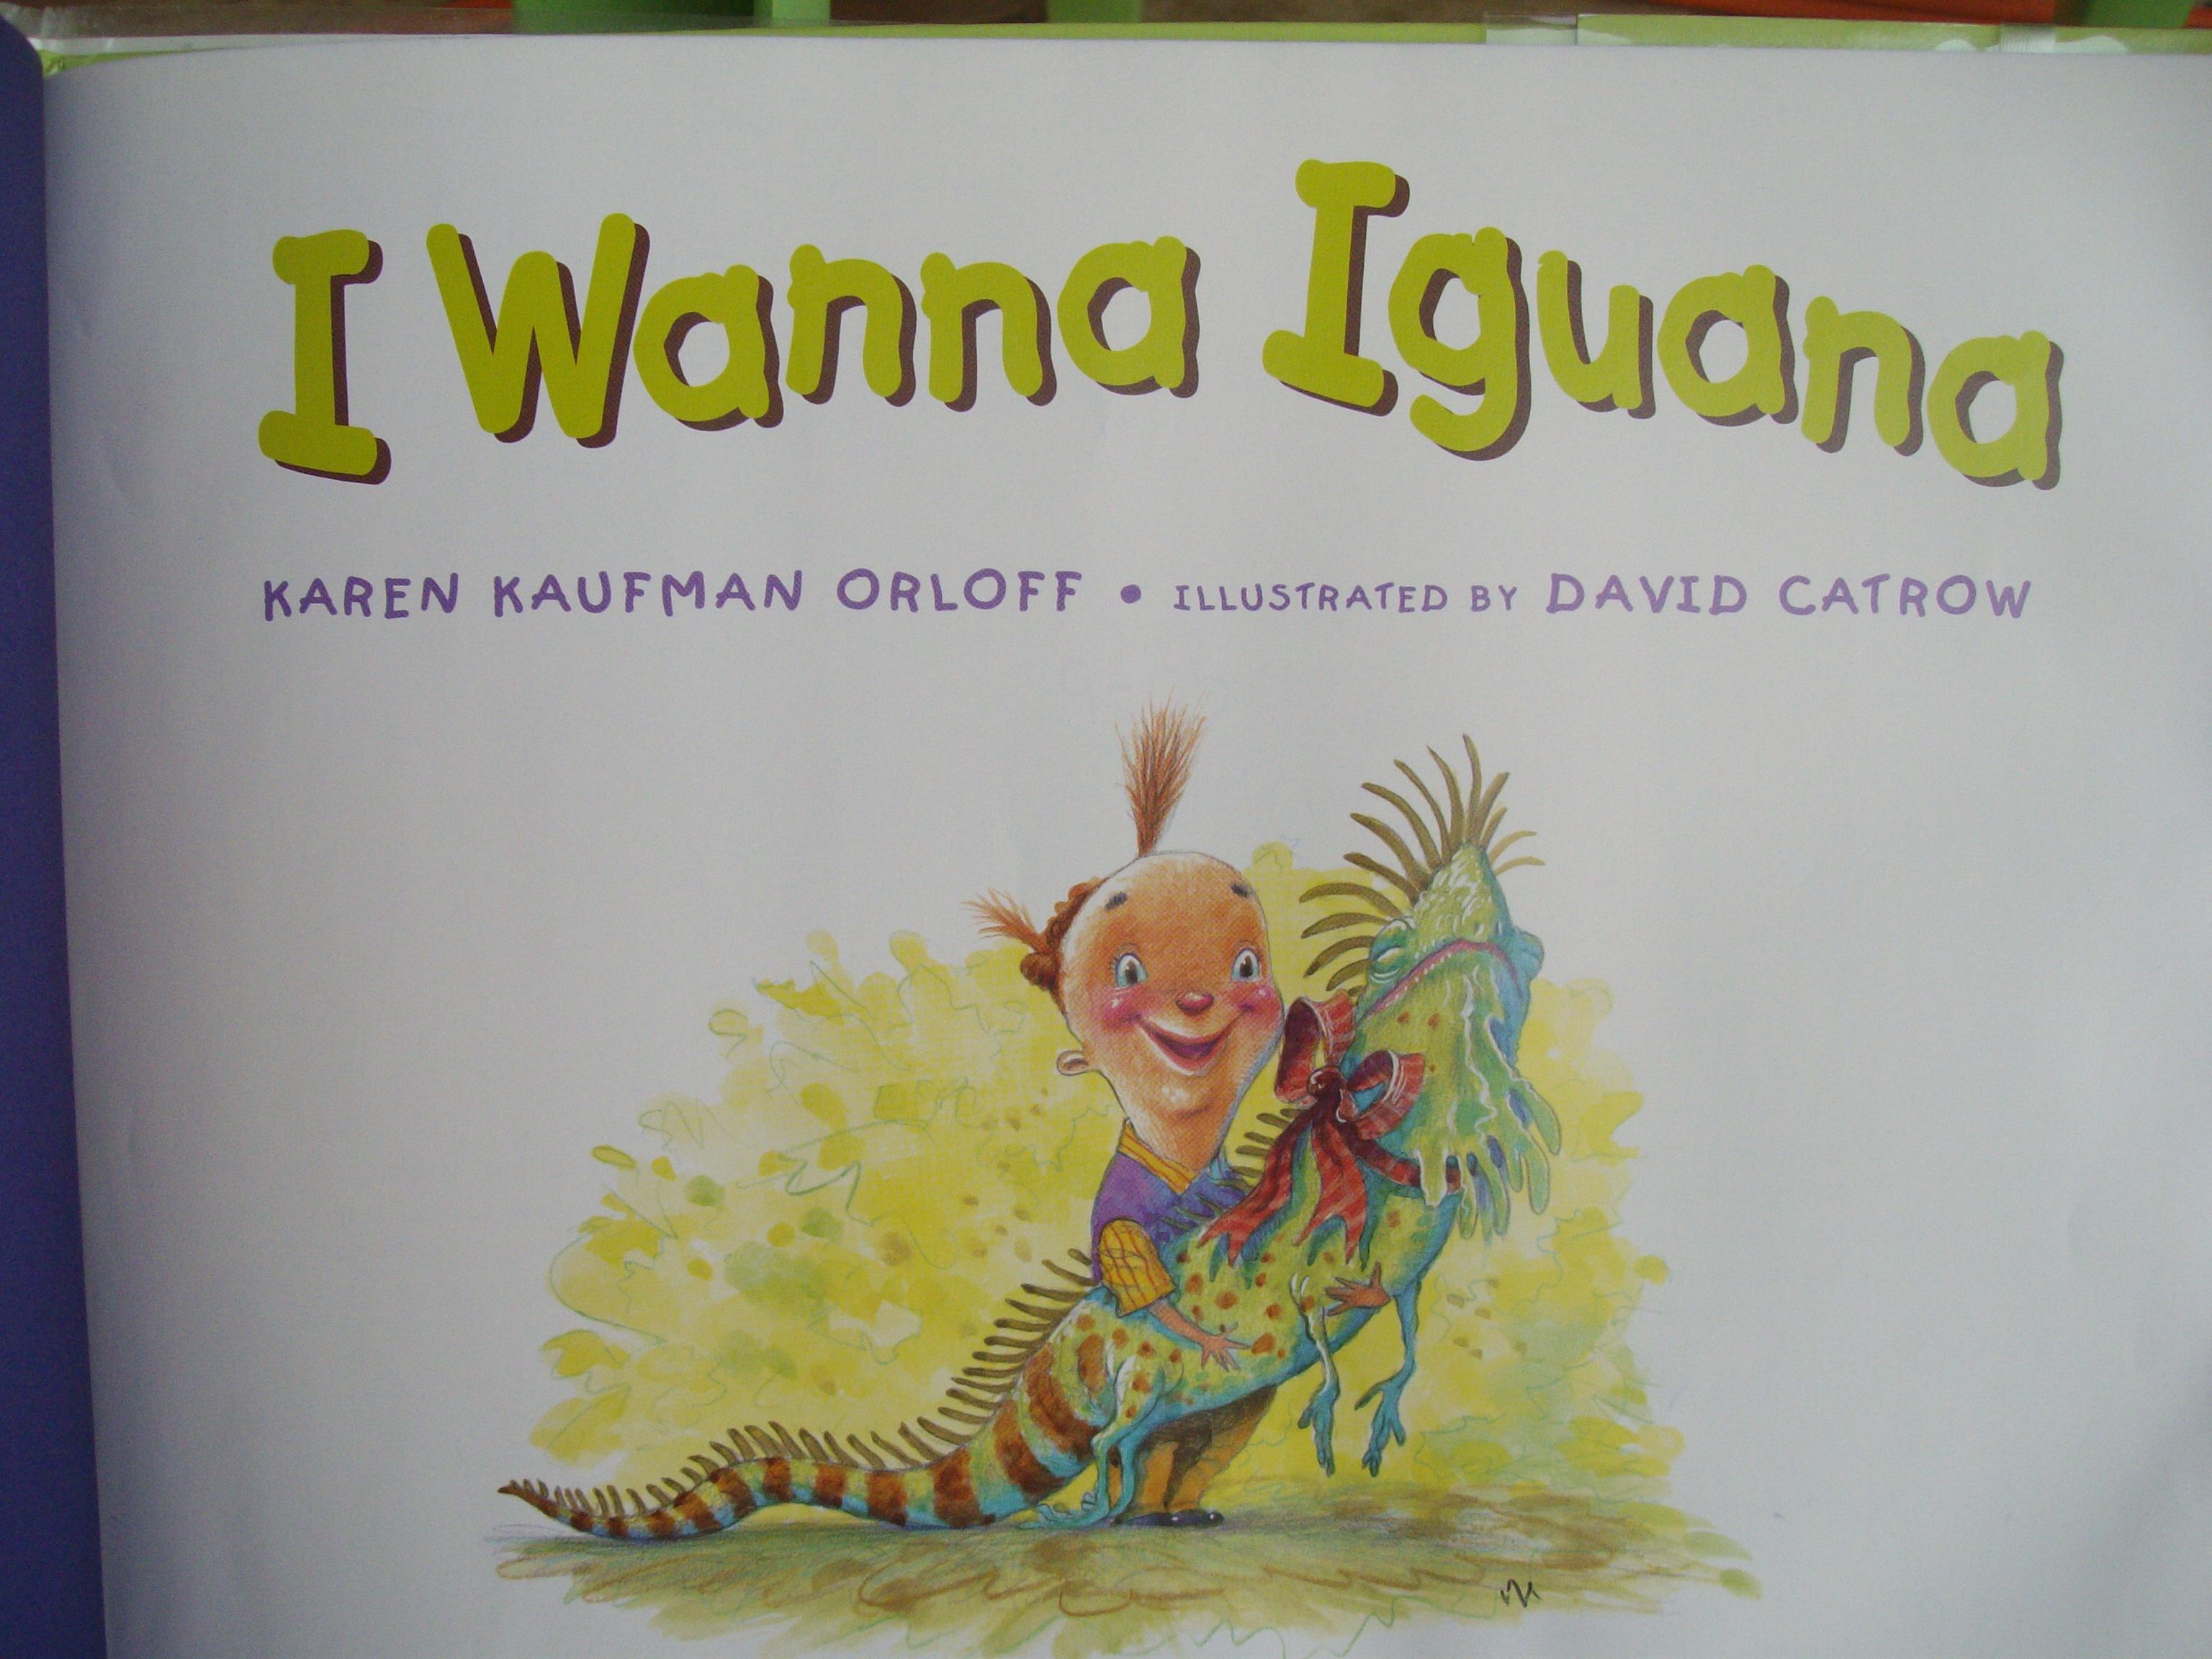 I Wanna Iguana By Karen Kaufman Orloff And David Catrow